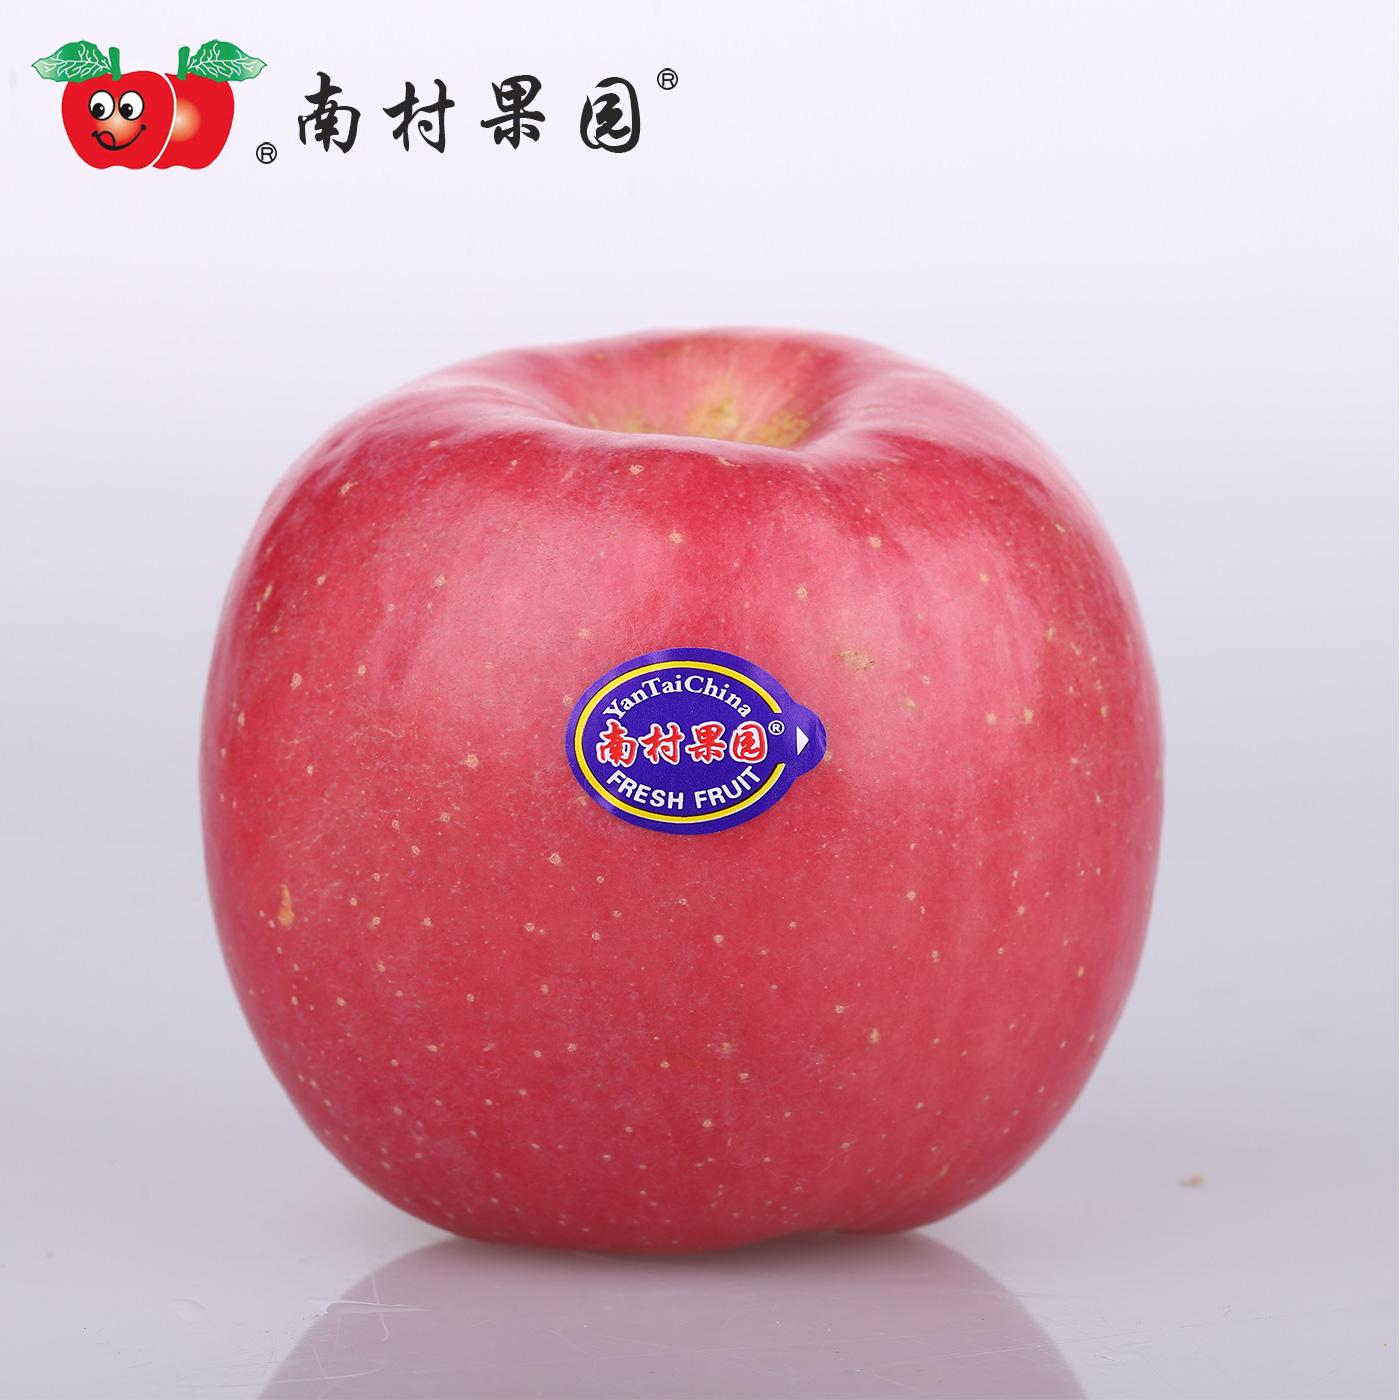 DDD Apple 95 big fruit 9 Jin Yantai special apple fruit